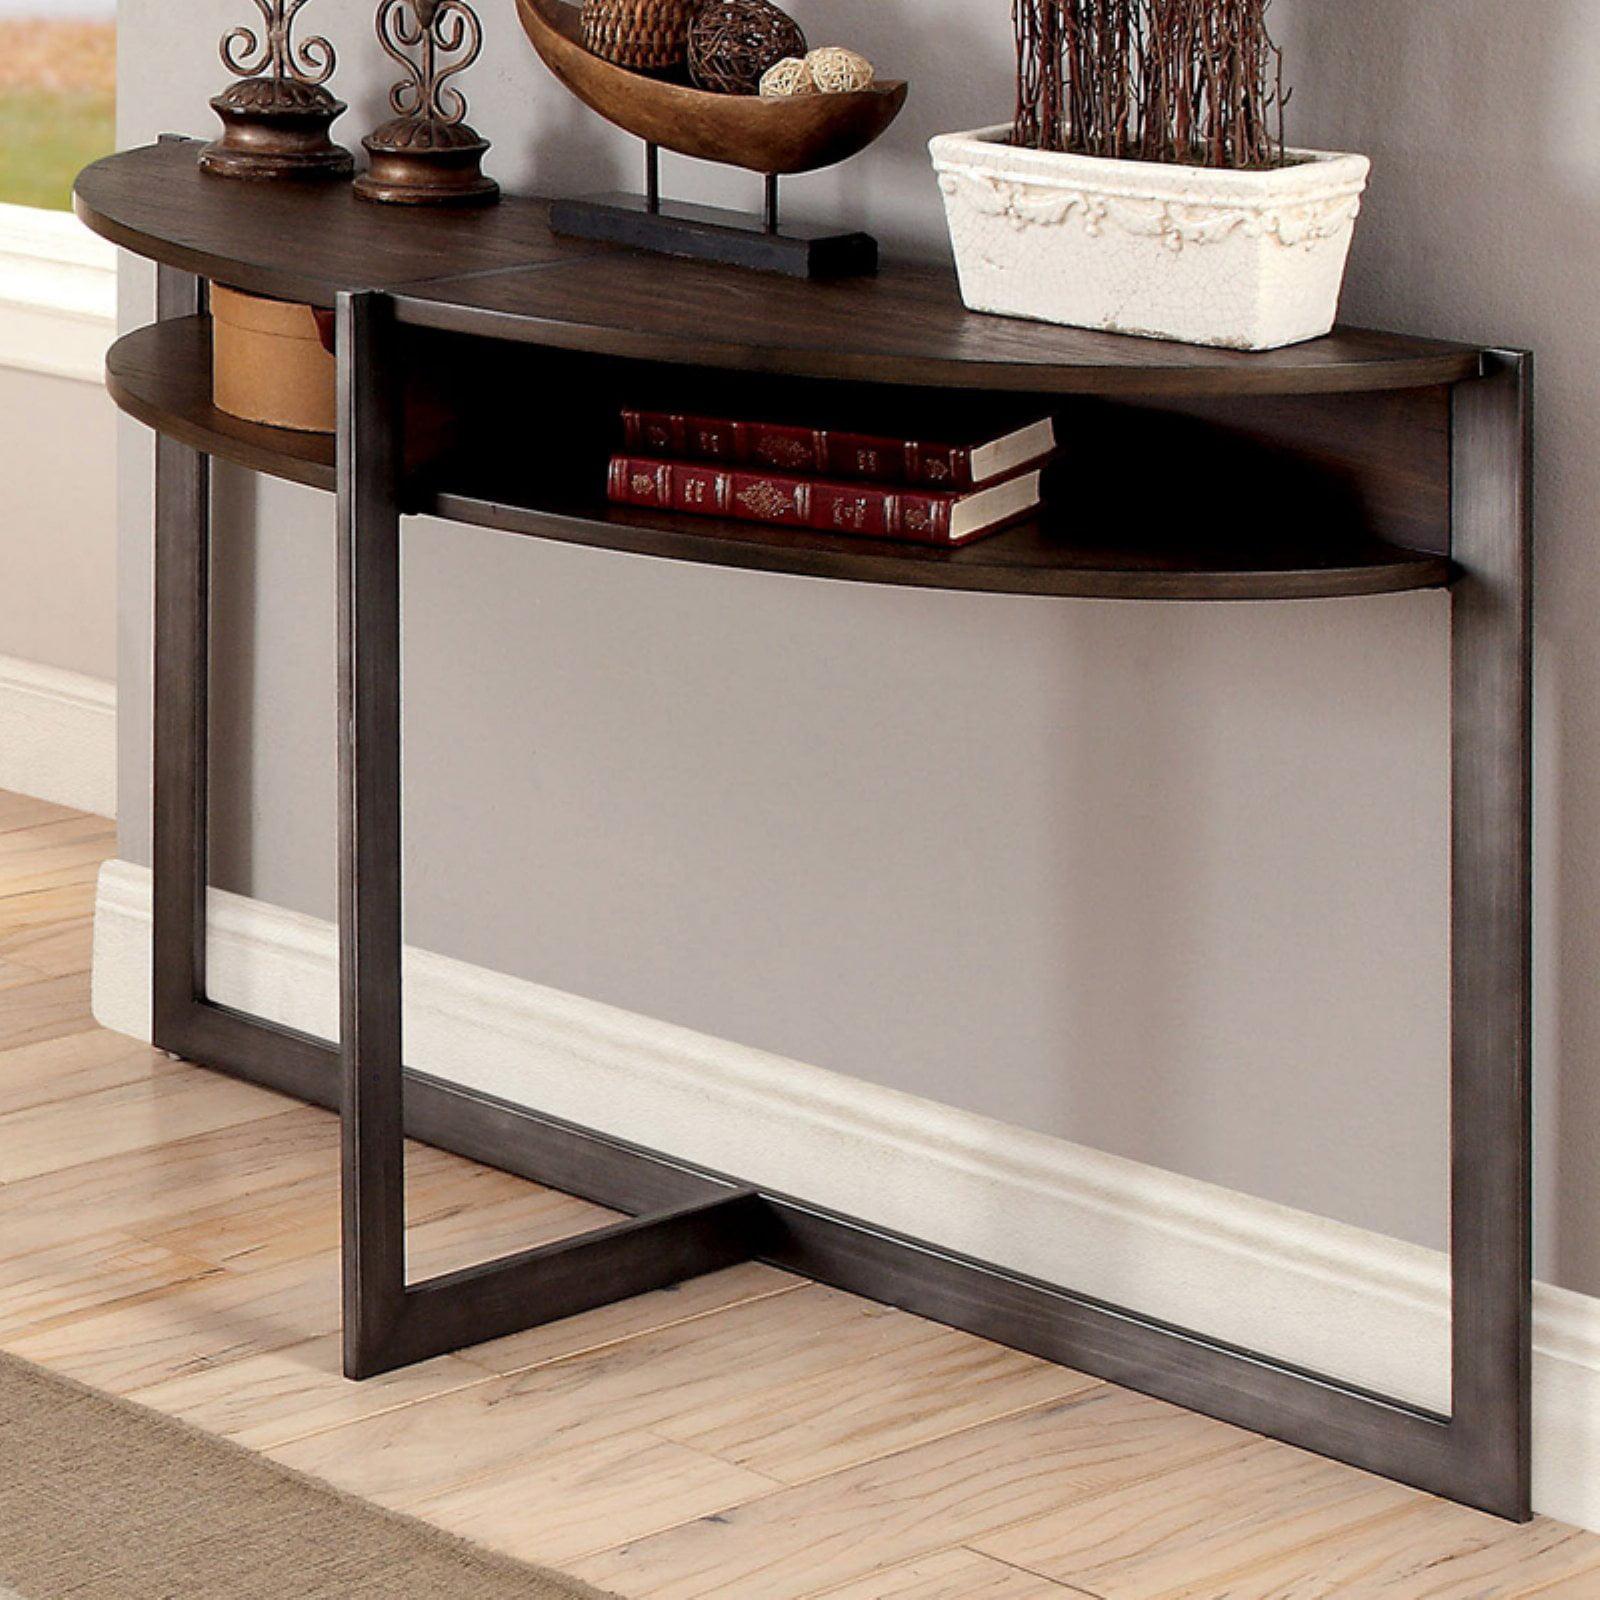 Furniture of America Bristol Rustic Sofa Table